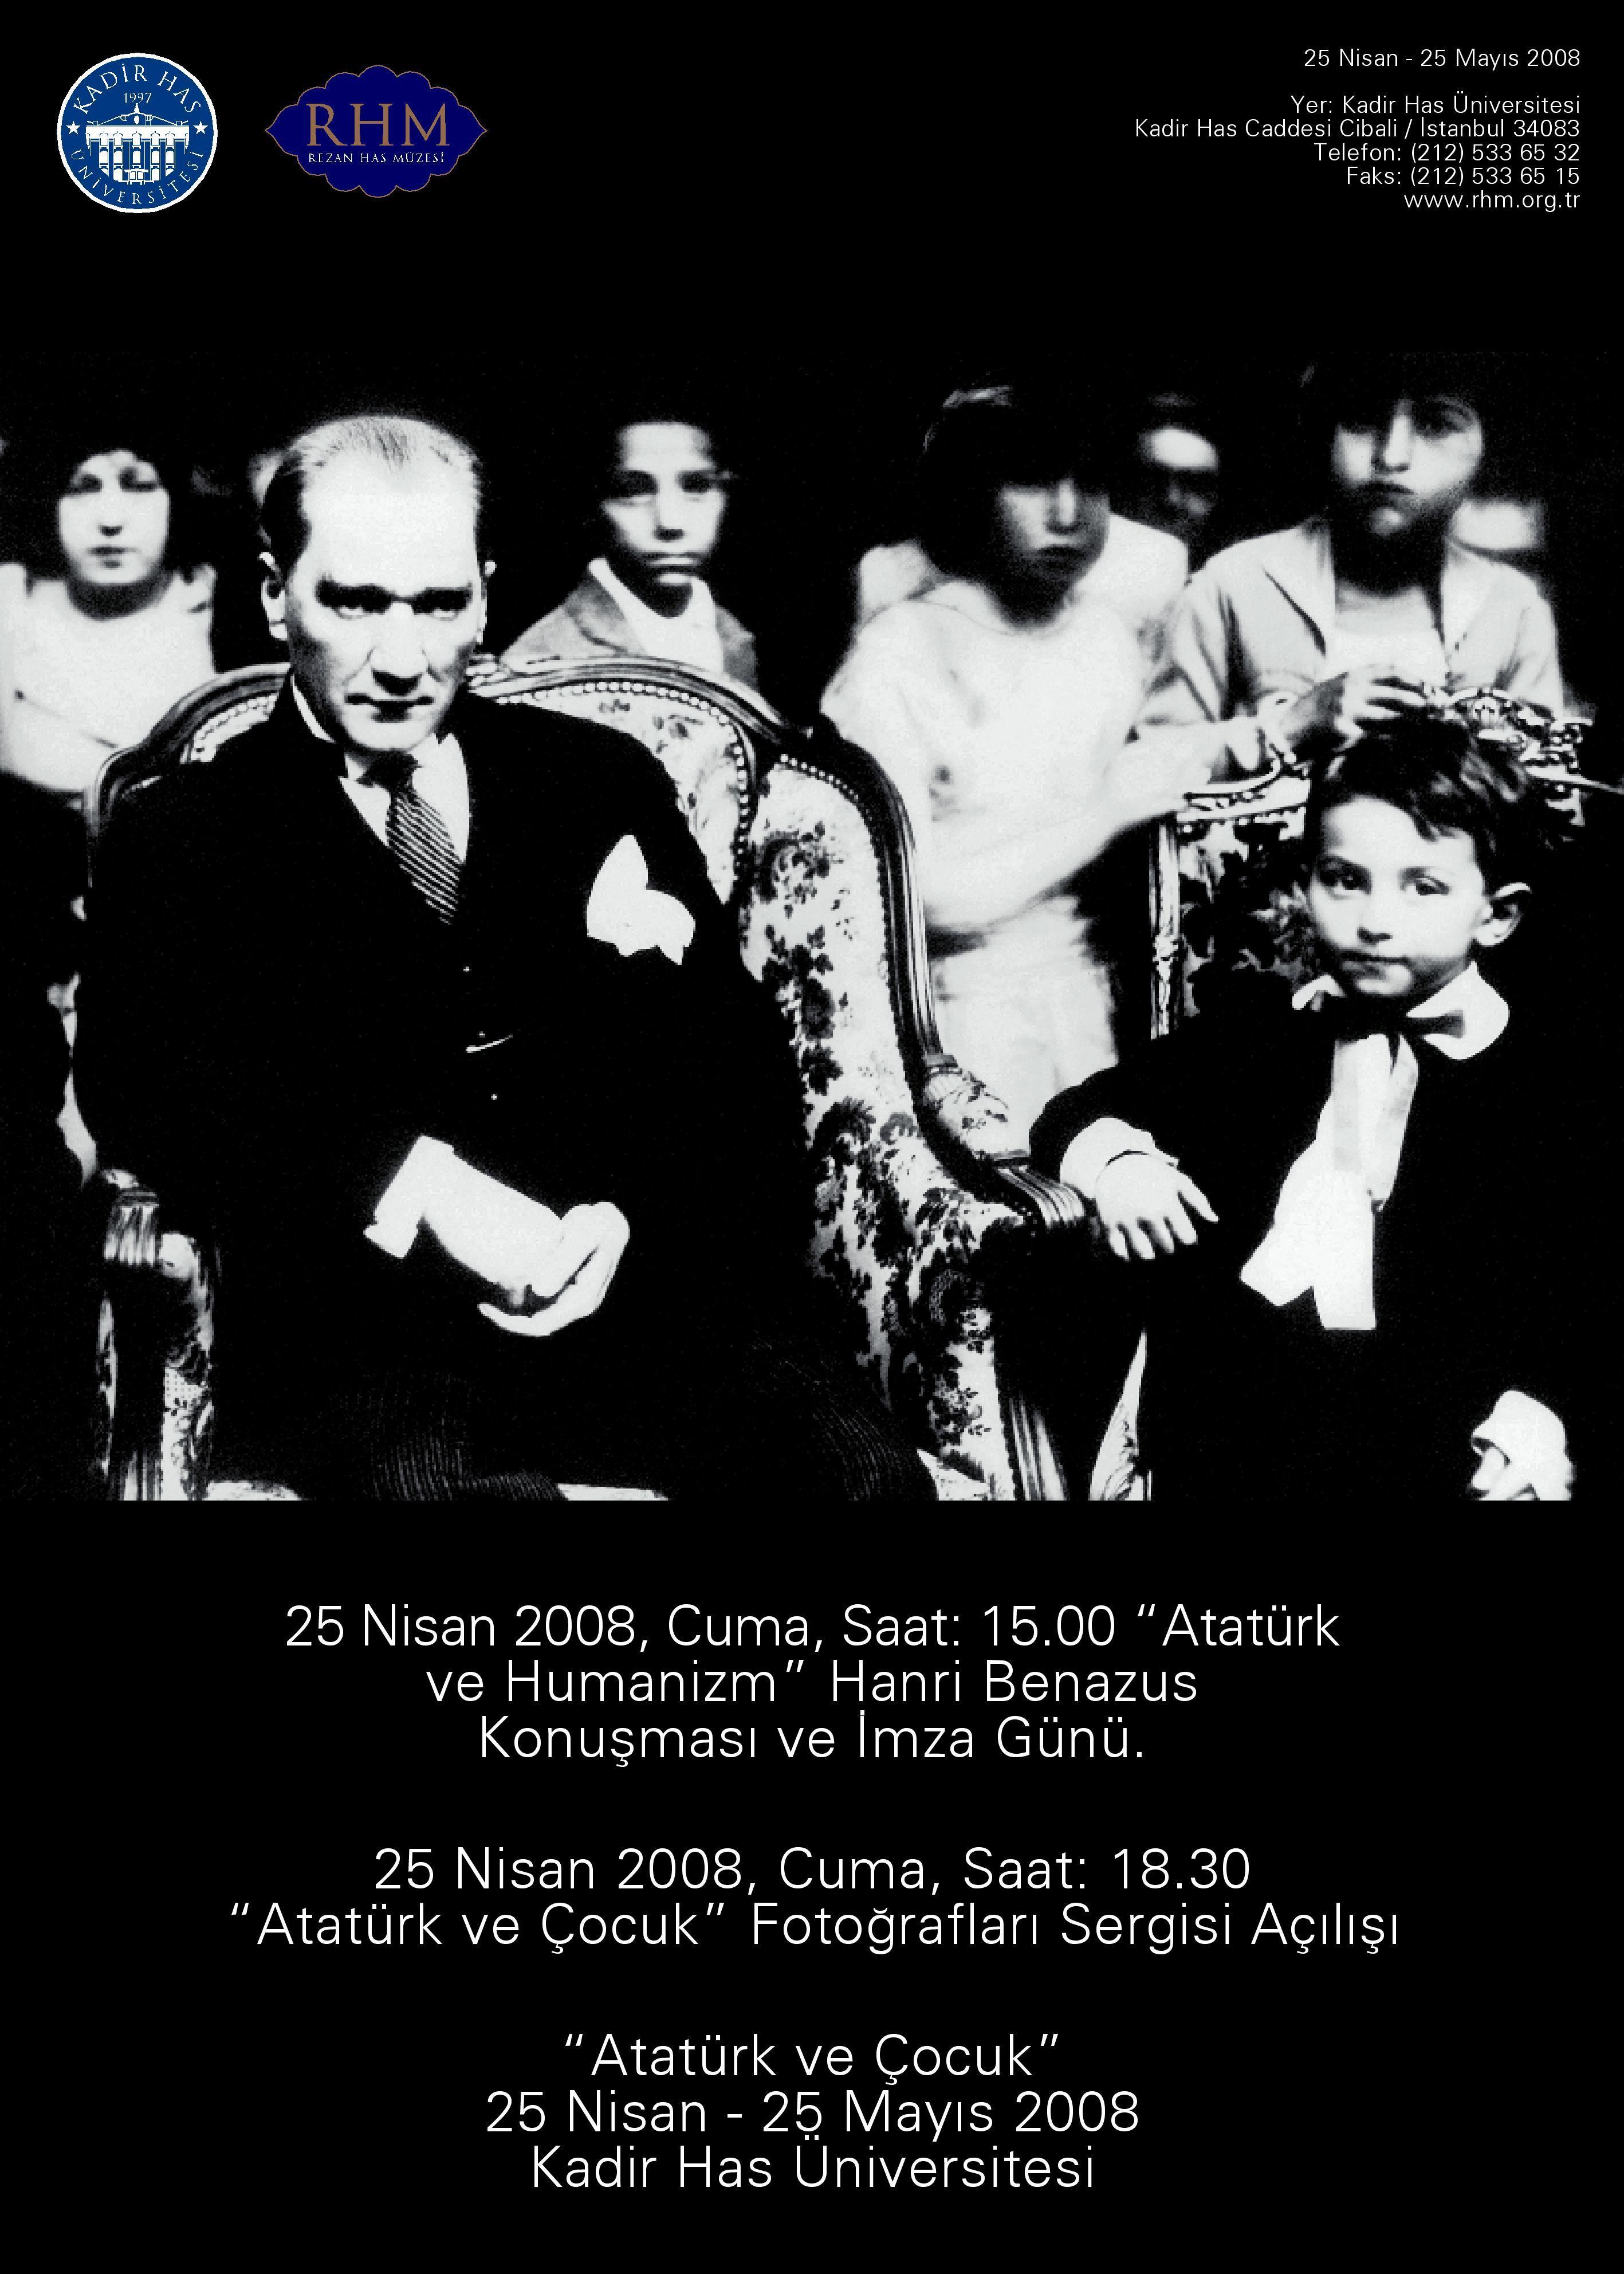 Ataturk ve cocuk poster